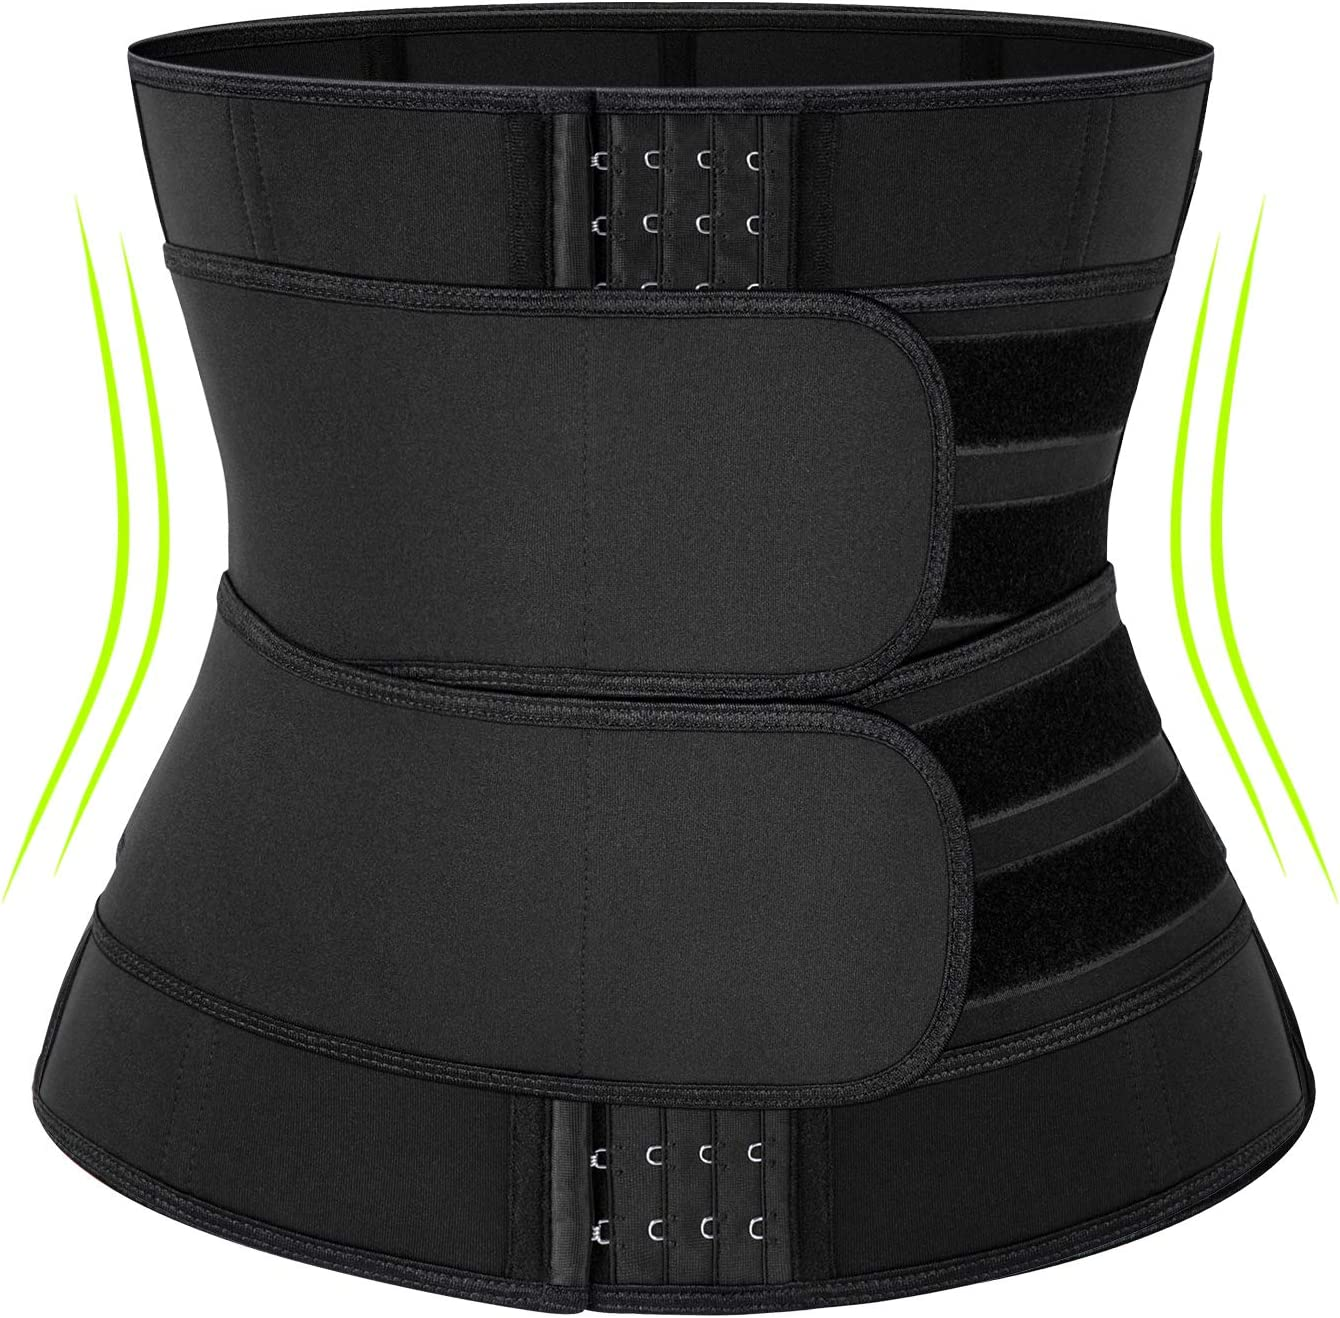 Neoprene Sauna Wide Waist Trainer Corset Sweat Belt for Women Weight Loss Compression Trimmer Workout Fitness Back Support